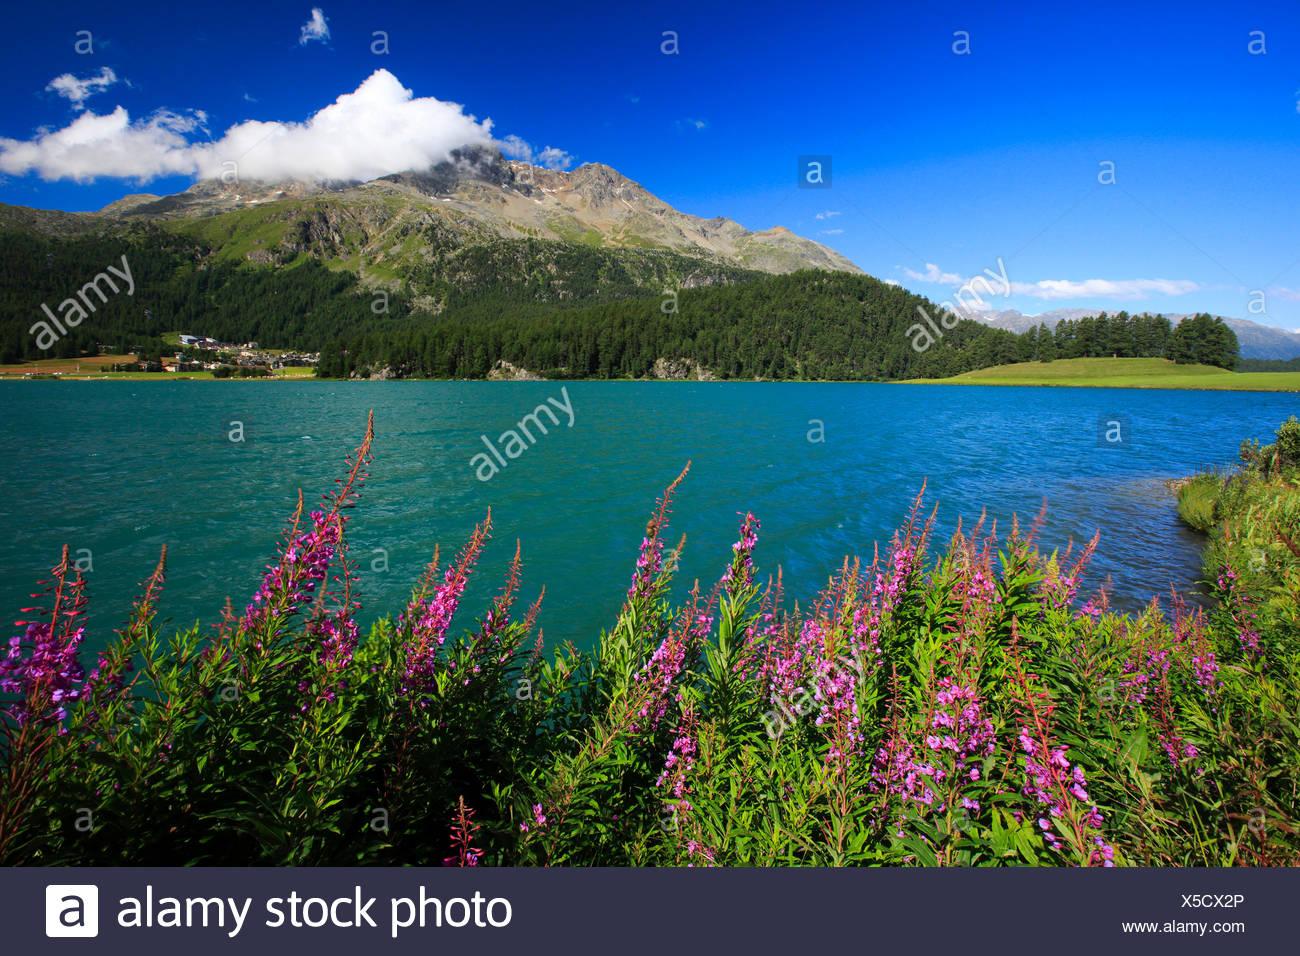 Fireweed, blooming sally, Rosebay willow-herb, Great willow-herb (Epilobium angustifolium, Chamerion angustifolium), Lej da Champf�r, Lej Suot, Piz Surlej, Switzerland, Grisons, Engadine Stock Photo